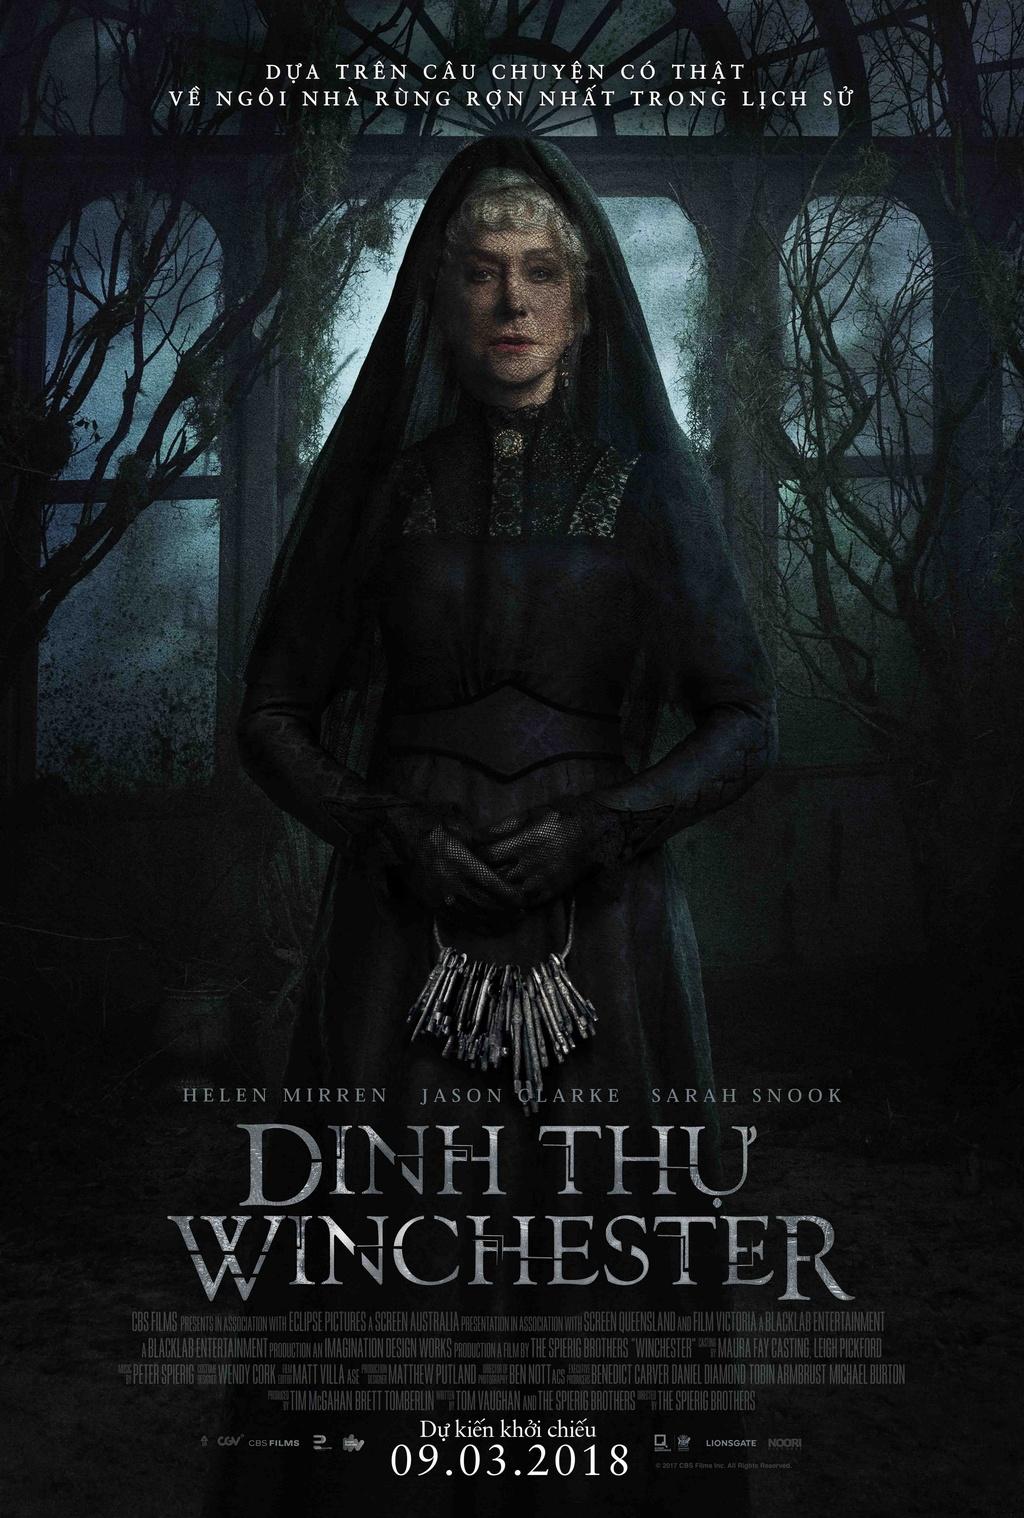 'Dinh thu Winchester': Tac pham kinh di hoi hot, do dang hinh anh 1